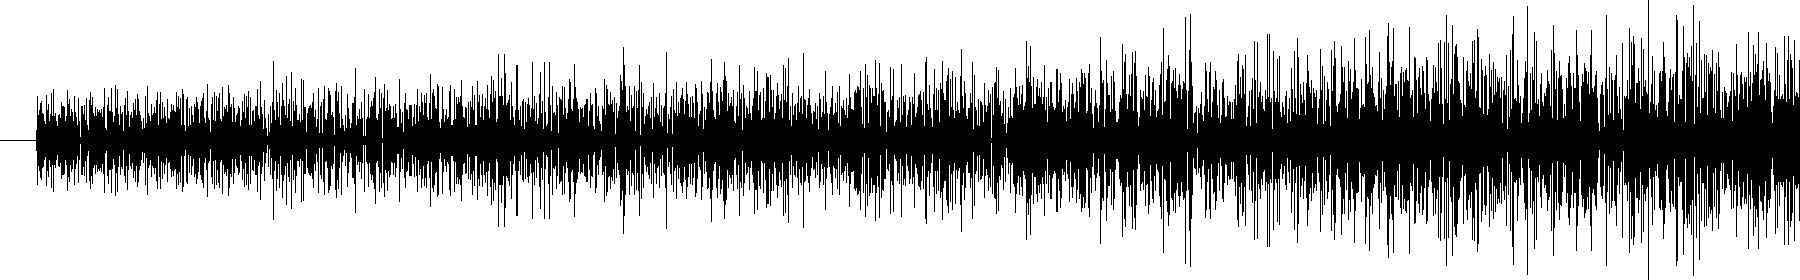 perc 1 39